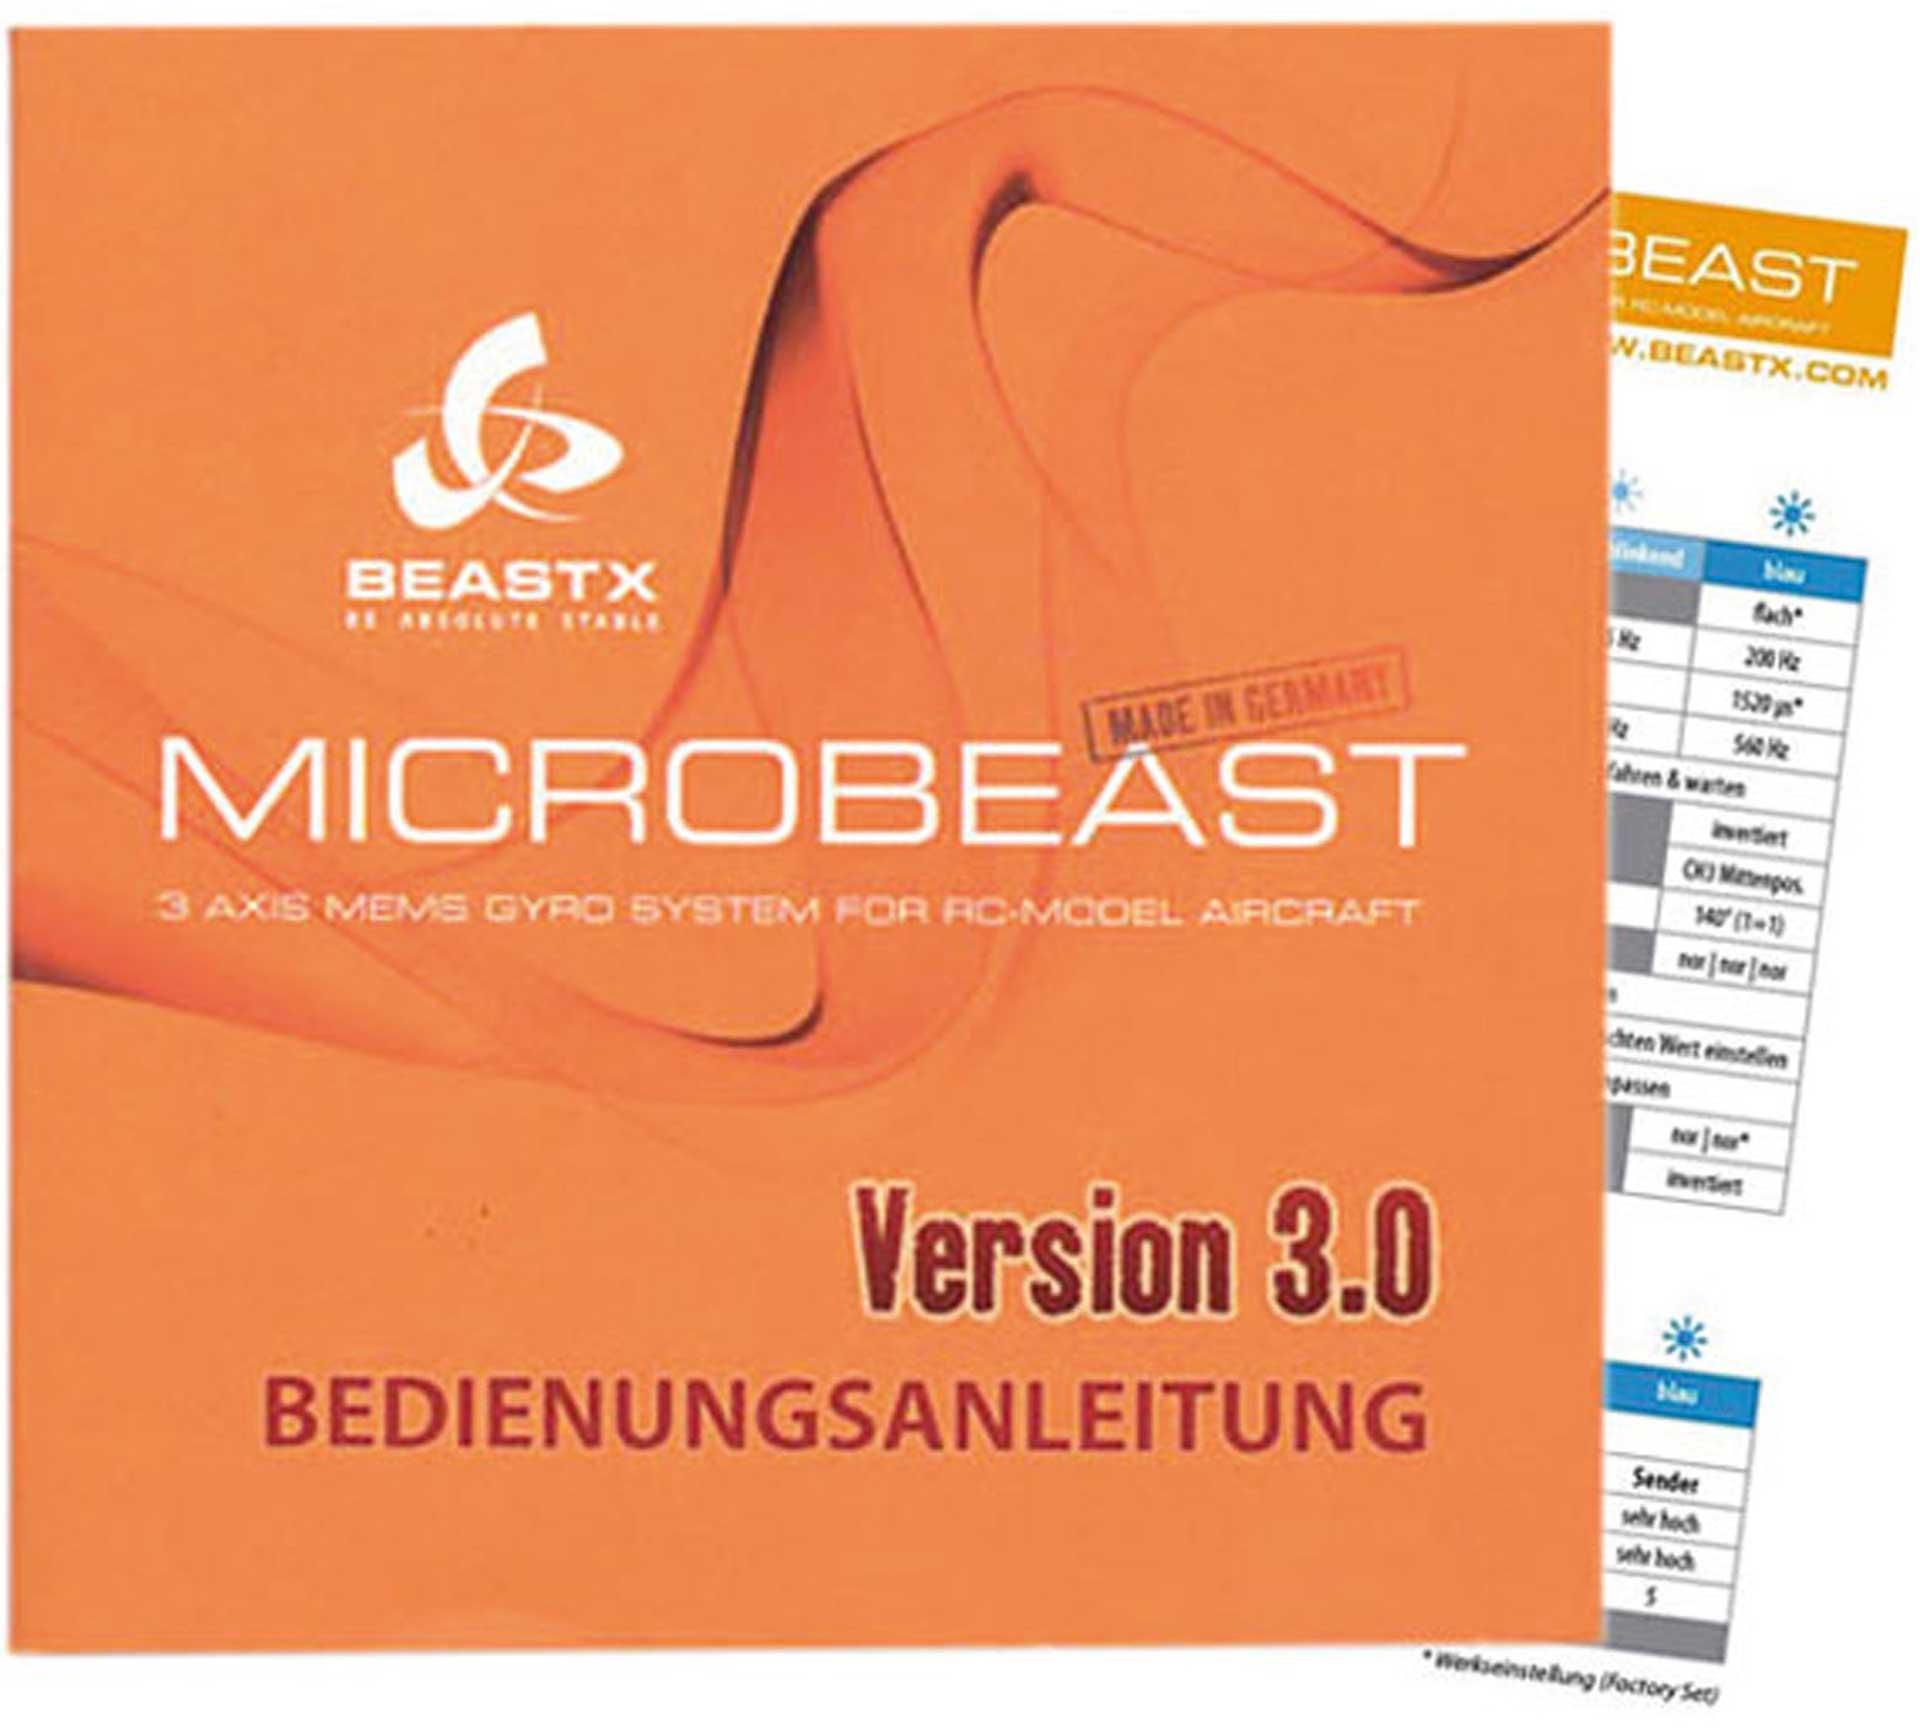 BEASTX MICROBEAST PLUS HD PRO EDITION